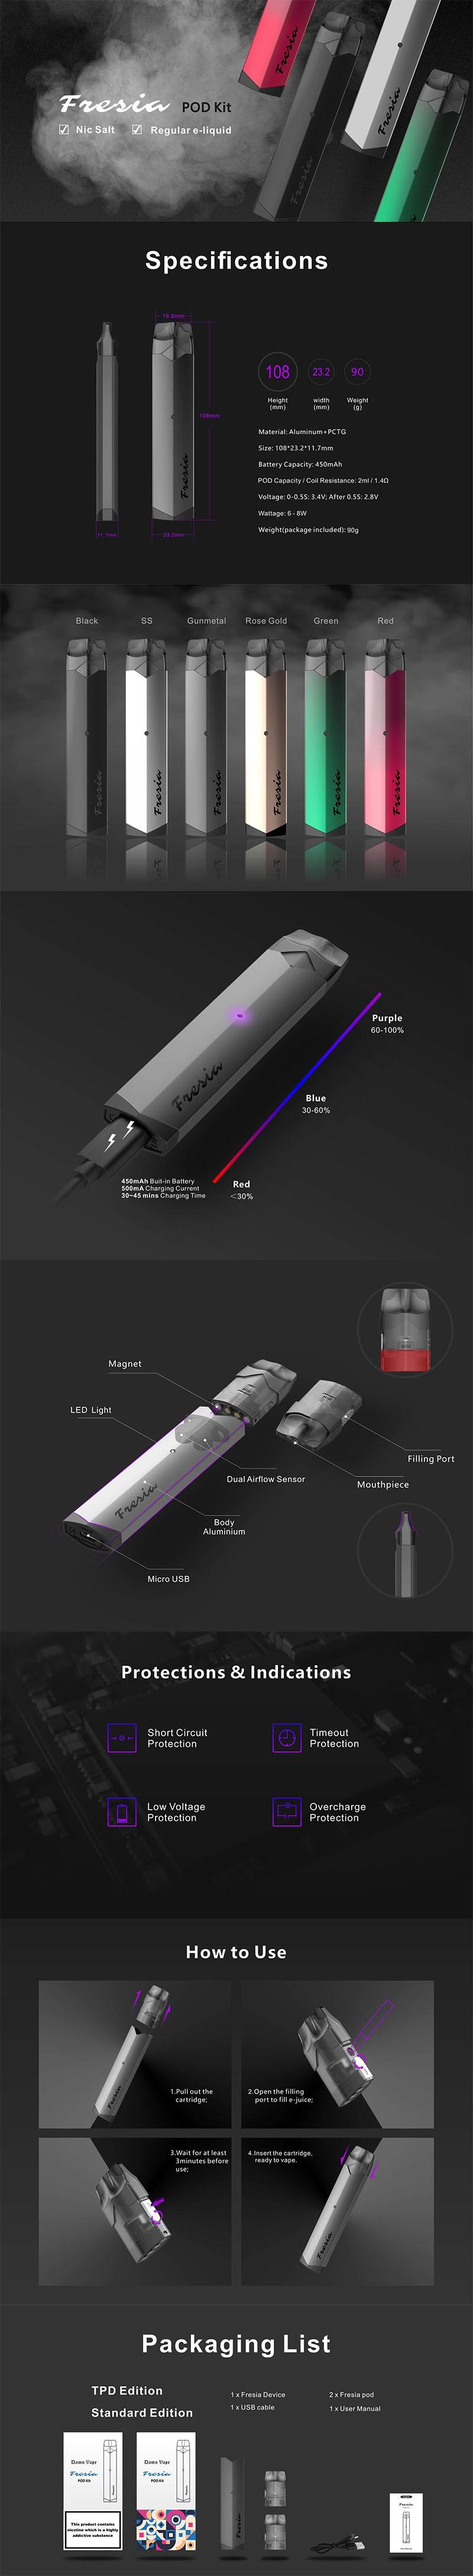 Damn Vape Fresia 8W 450mAh MTL Refillable Pod System Vape Starter Kit